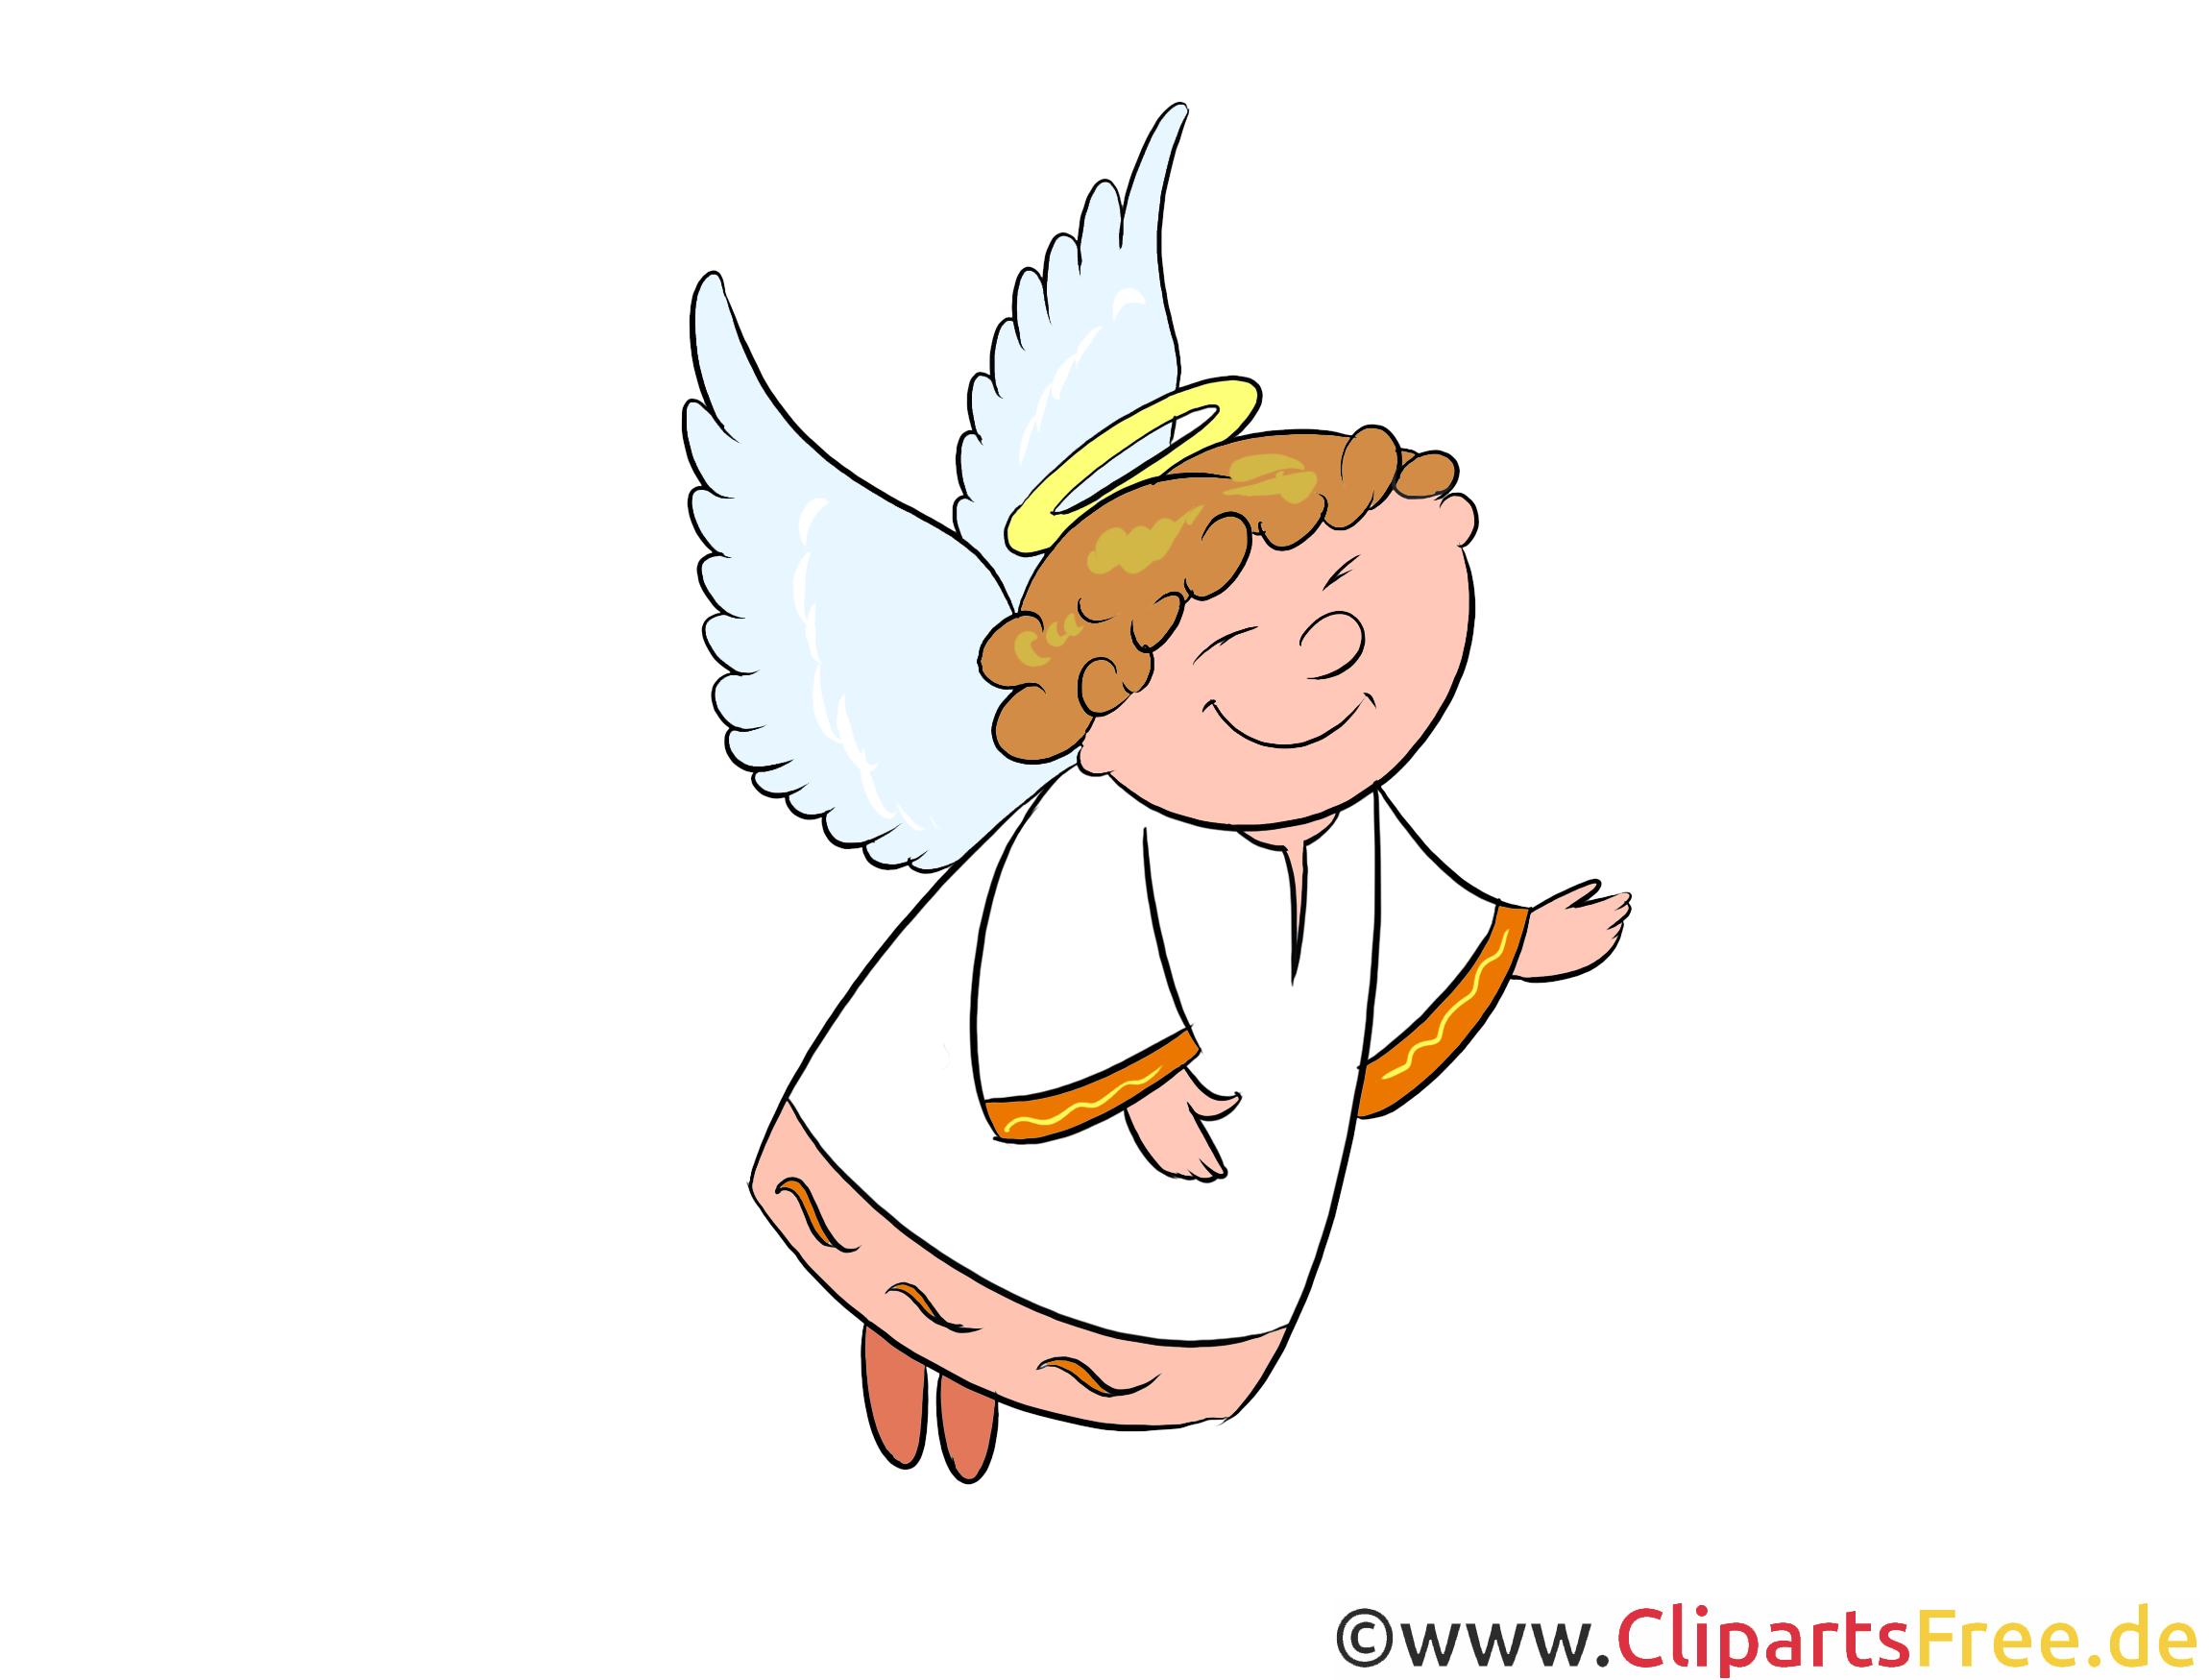 Engel Illustration Clipart Bild Grafik